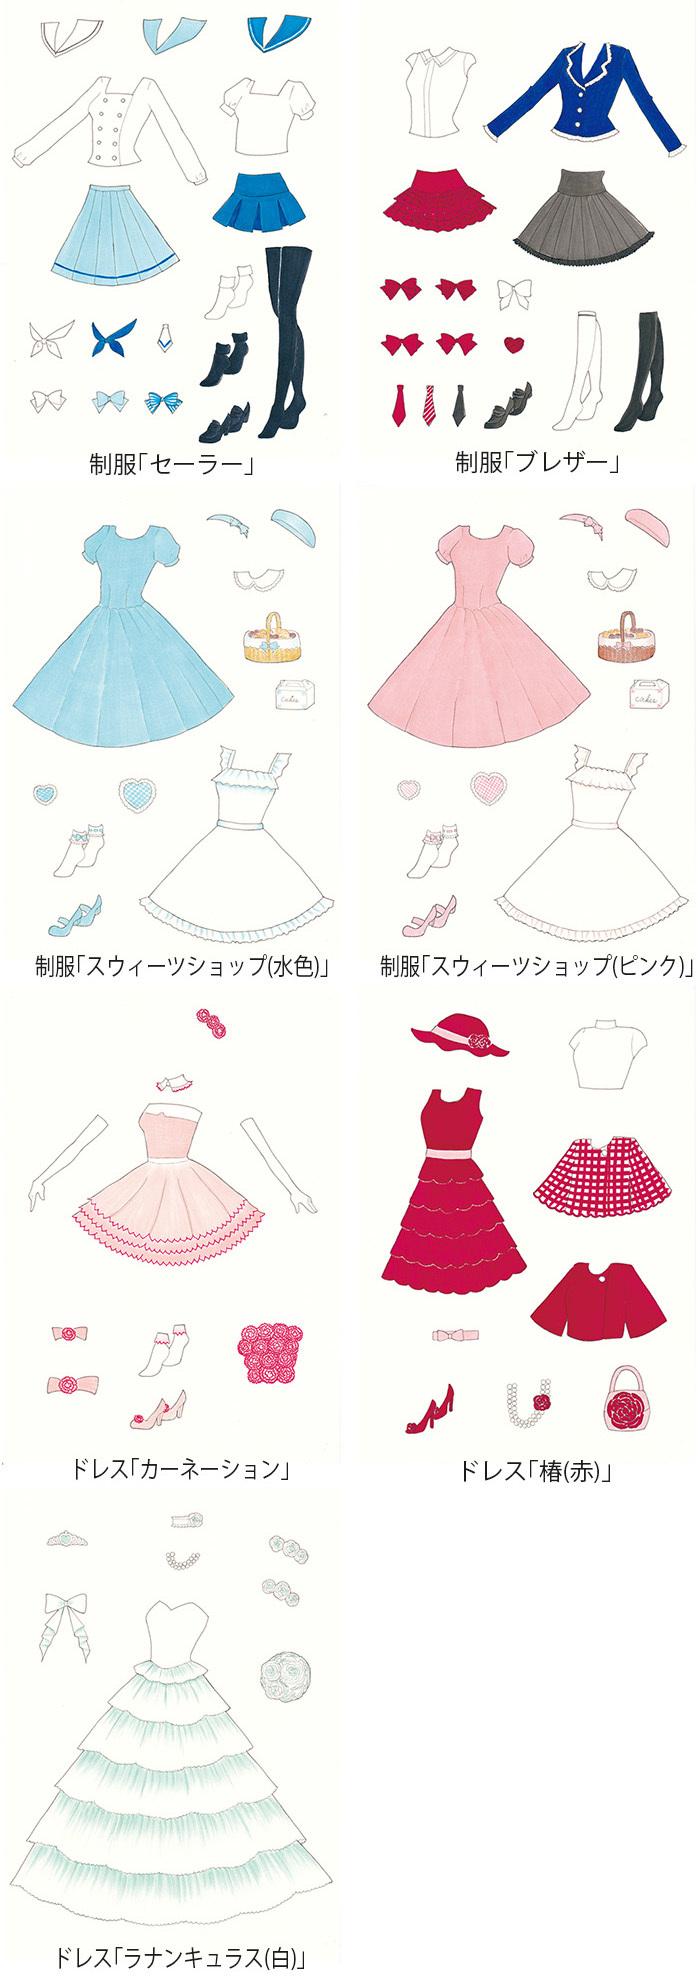 mihon3_youfuku_all.jpg